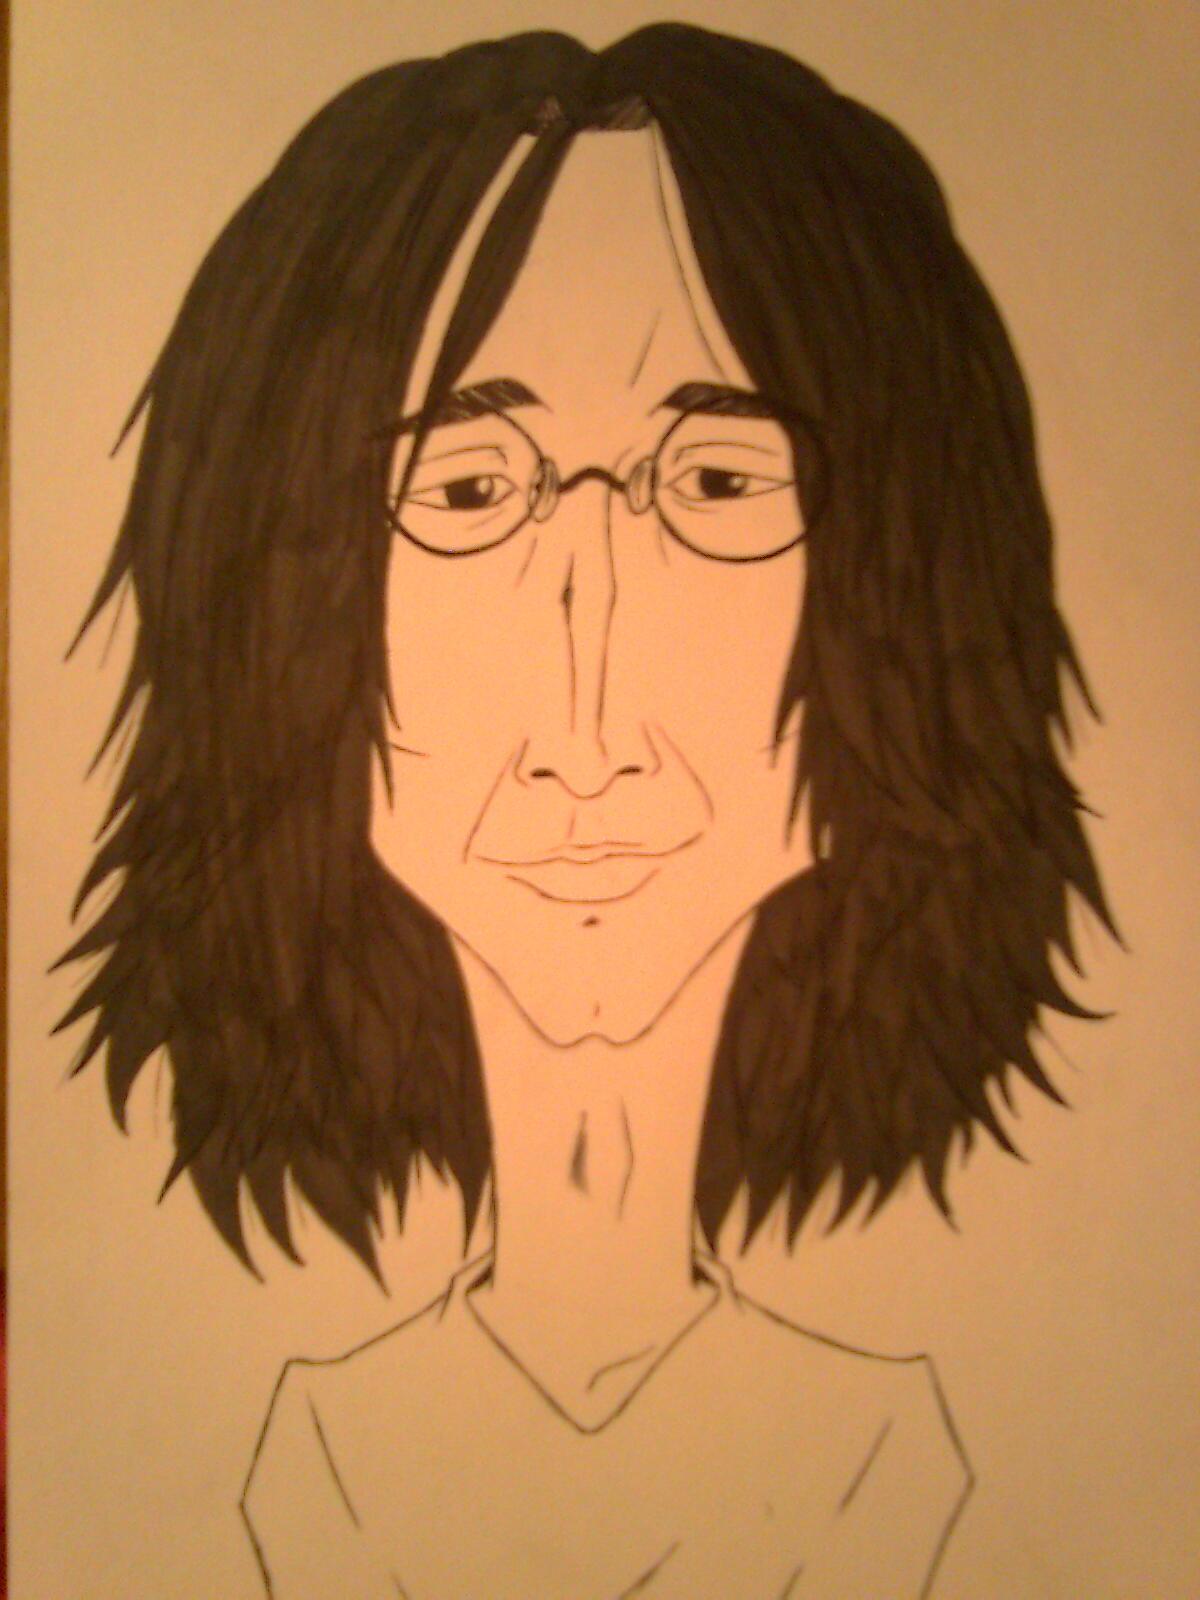 John Lennon Caricature